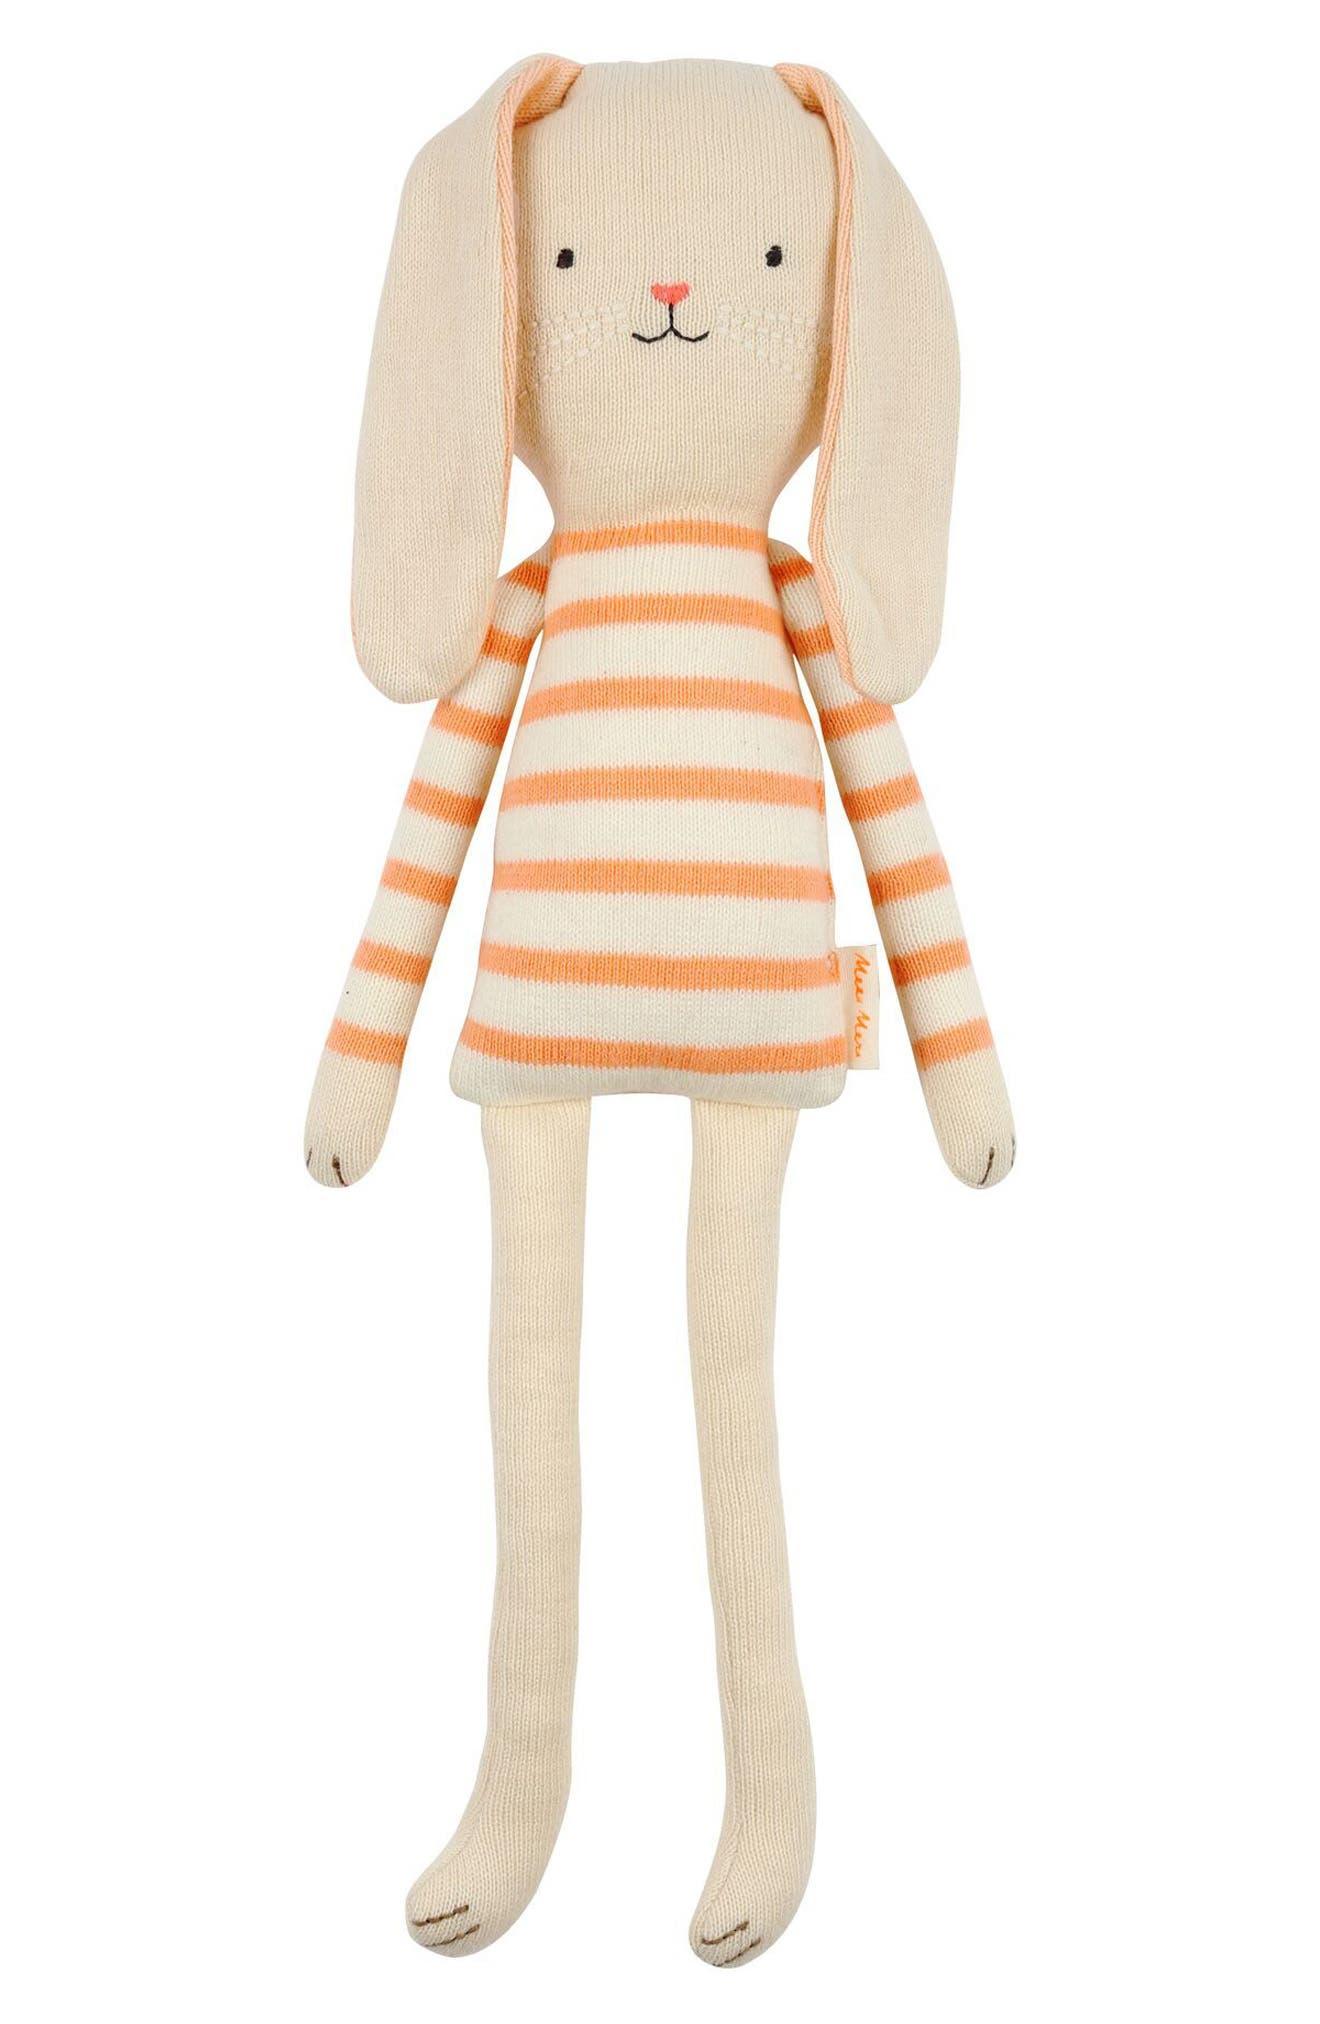 Small Stripe Sweater Organic Cotton Knit Bunny,                             Main thumbnail 1, color,                             950